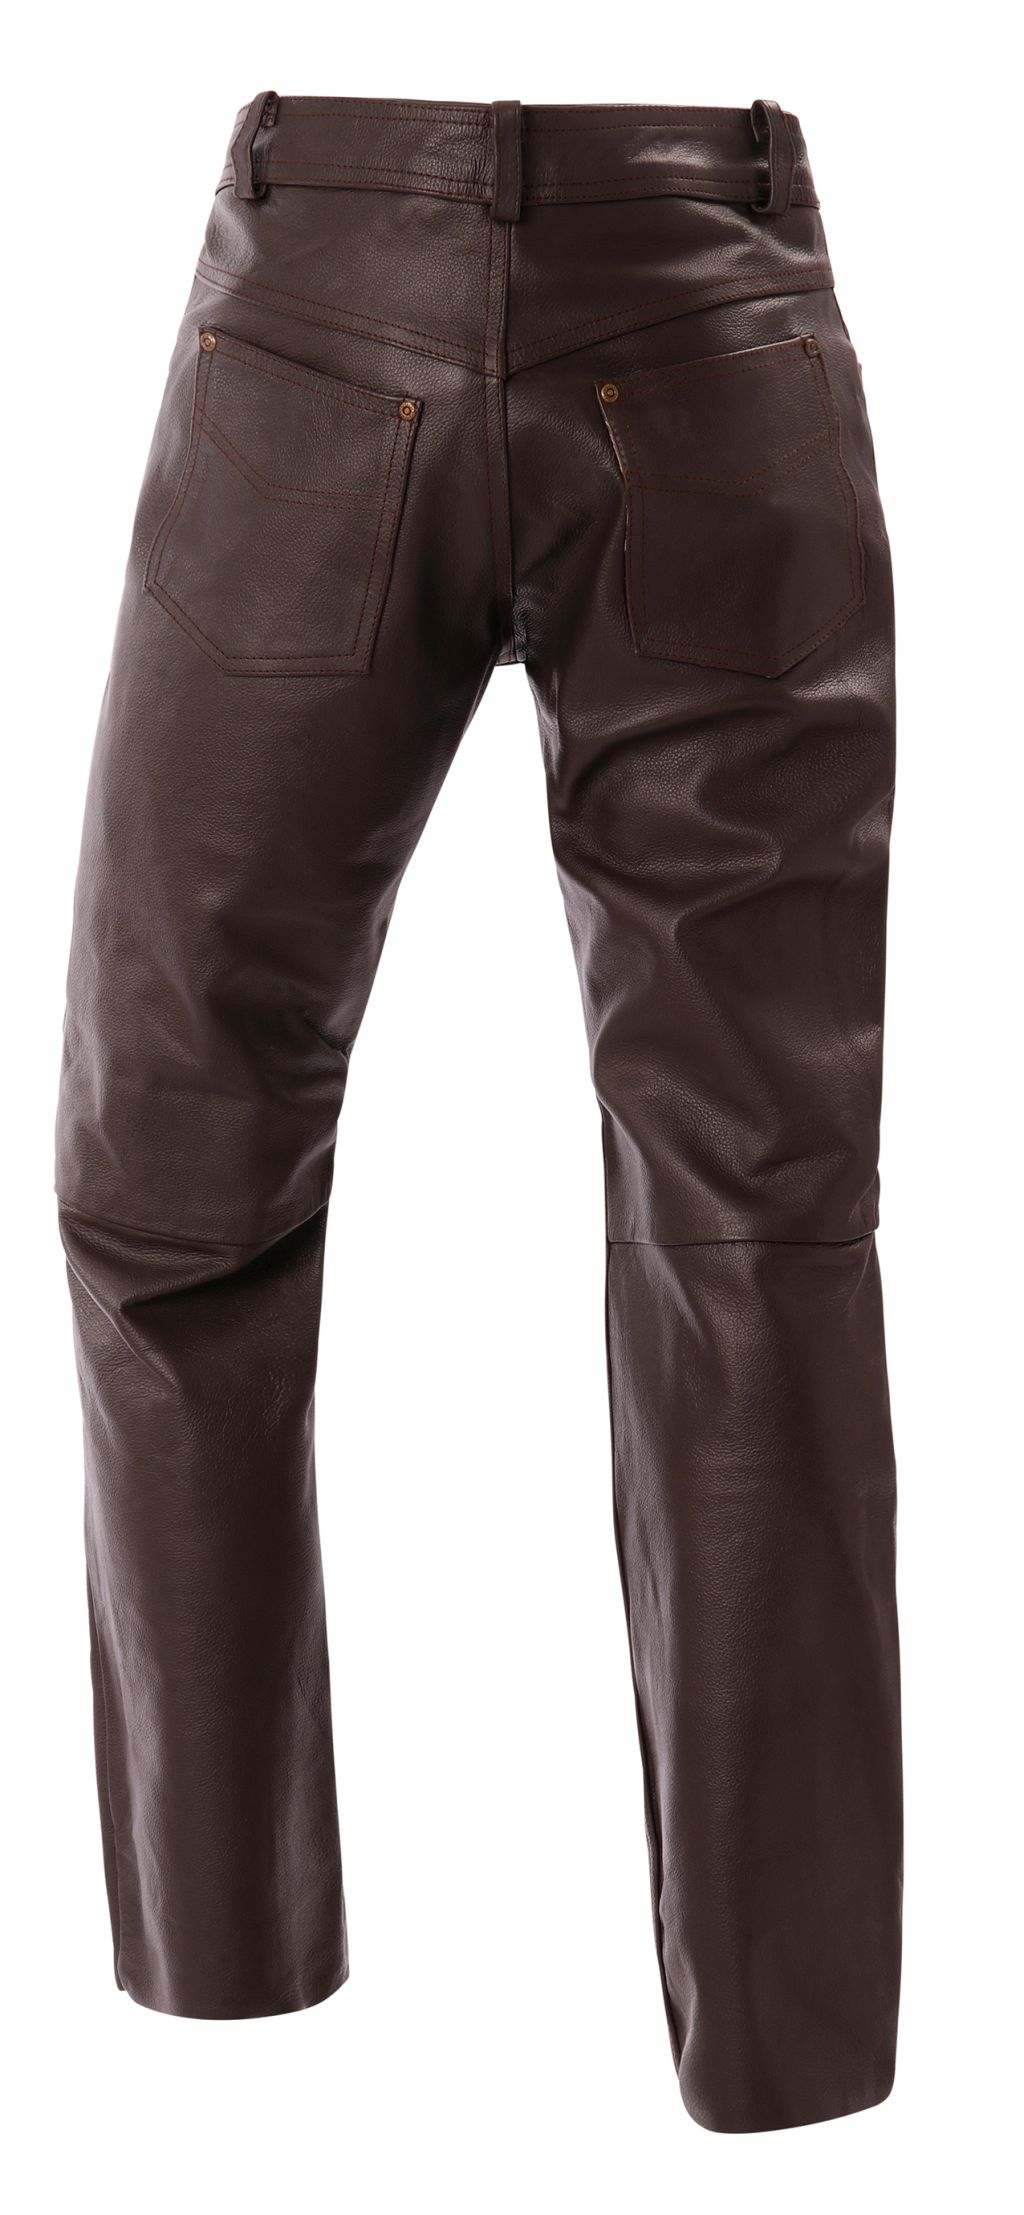 Bangla Herren Bekleidung Motorrad Lederhose 1507 Braun 36 38 40 42 44 46